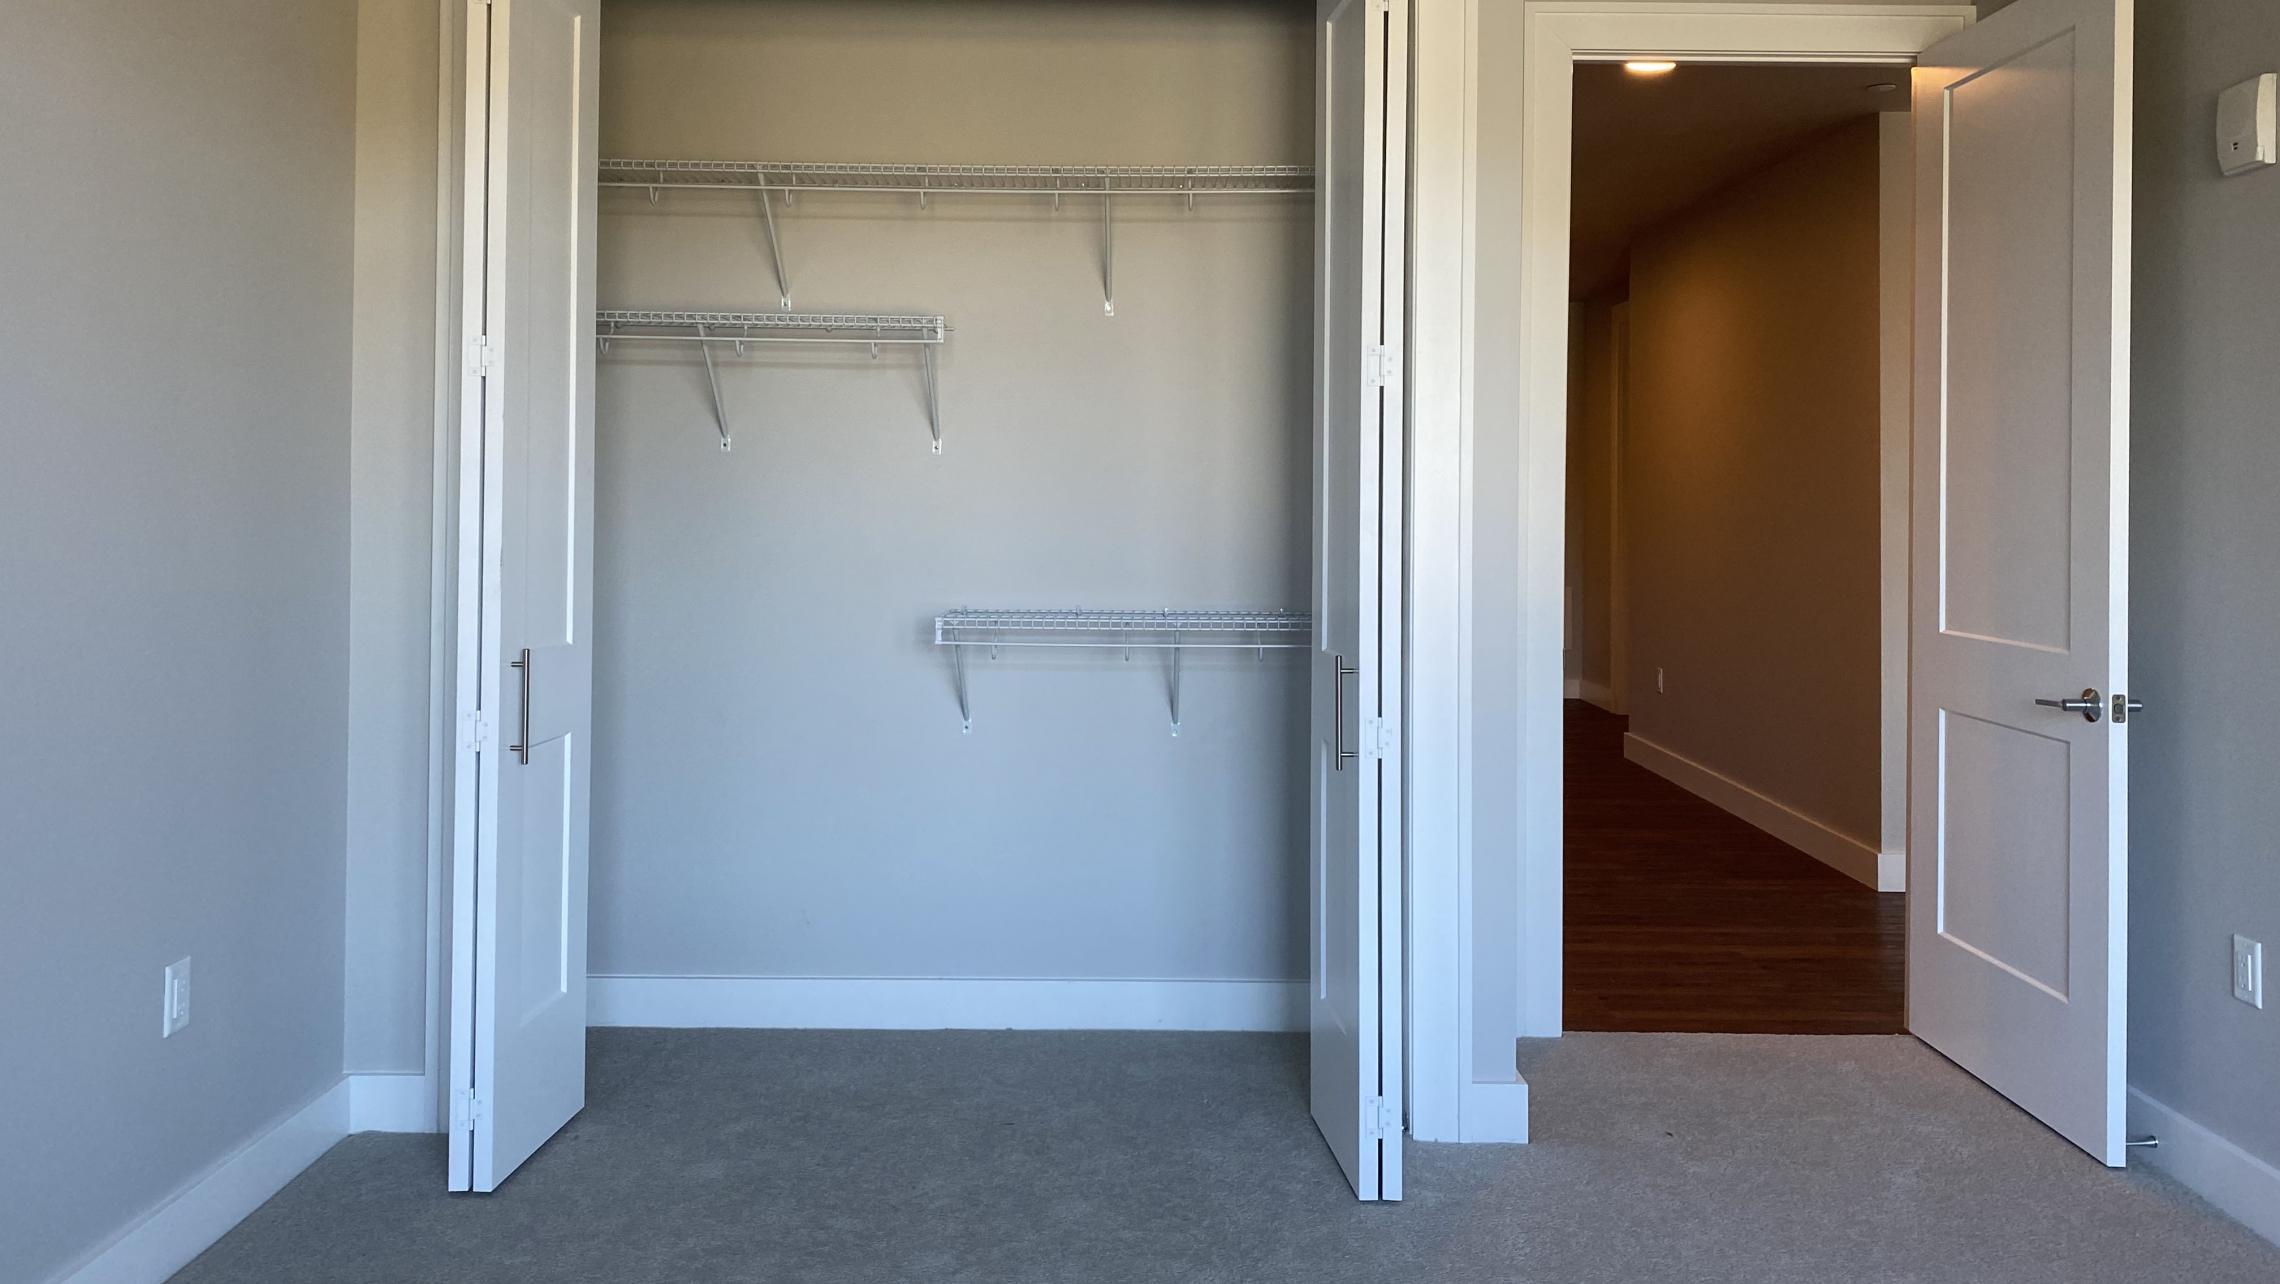 1722-Monroe-Apartment-220-Three Bedroom-Modern-Luxury-Corner-Balcony-Urban-Living-Bedroom-Closet